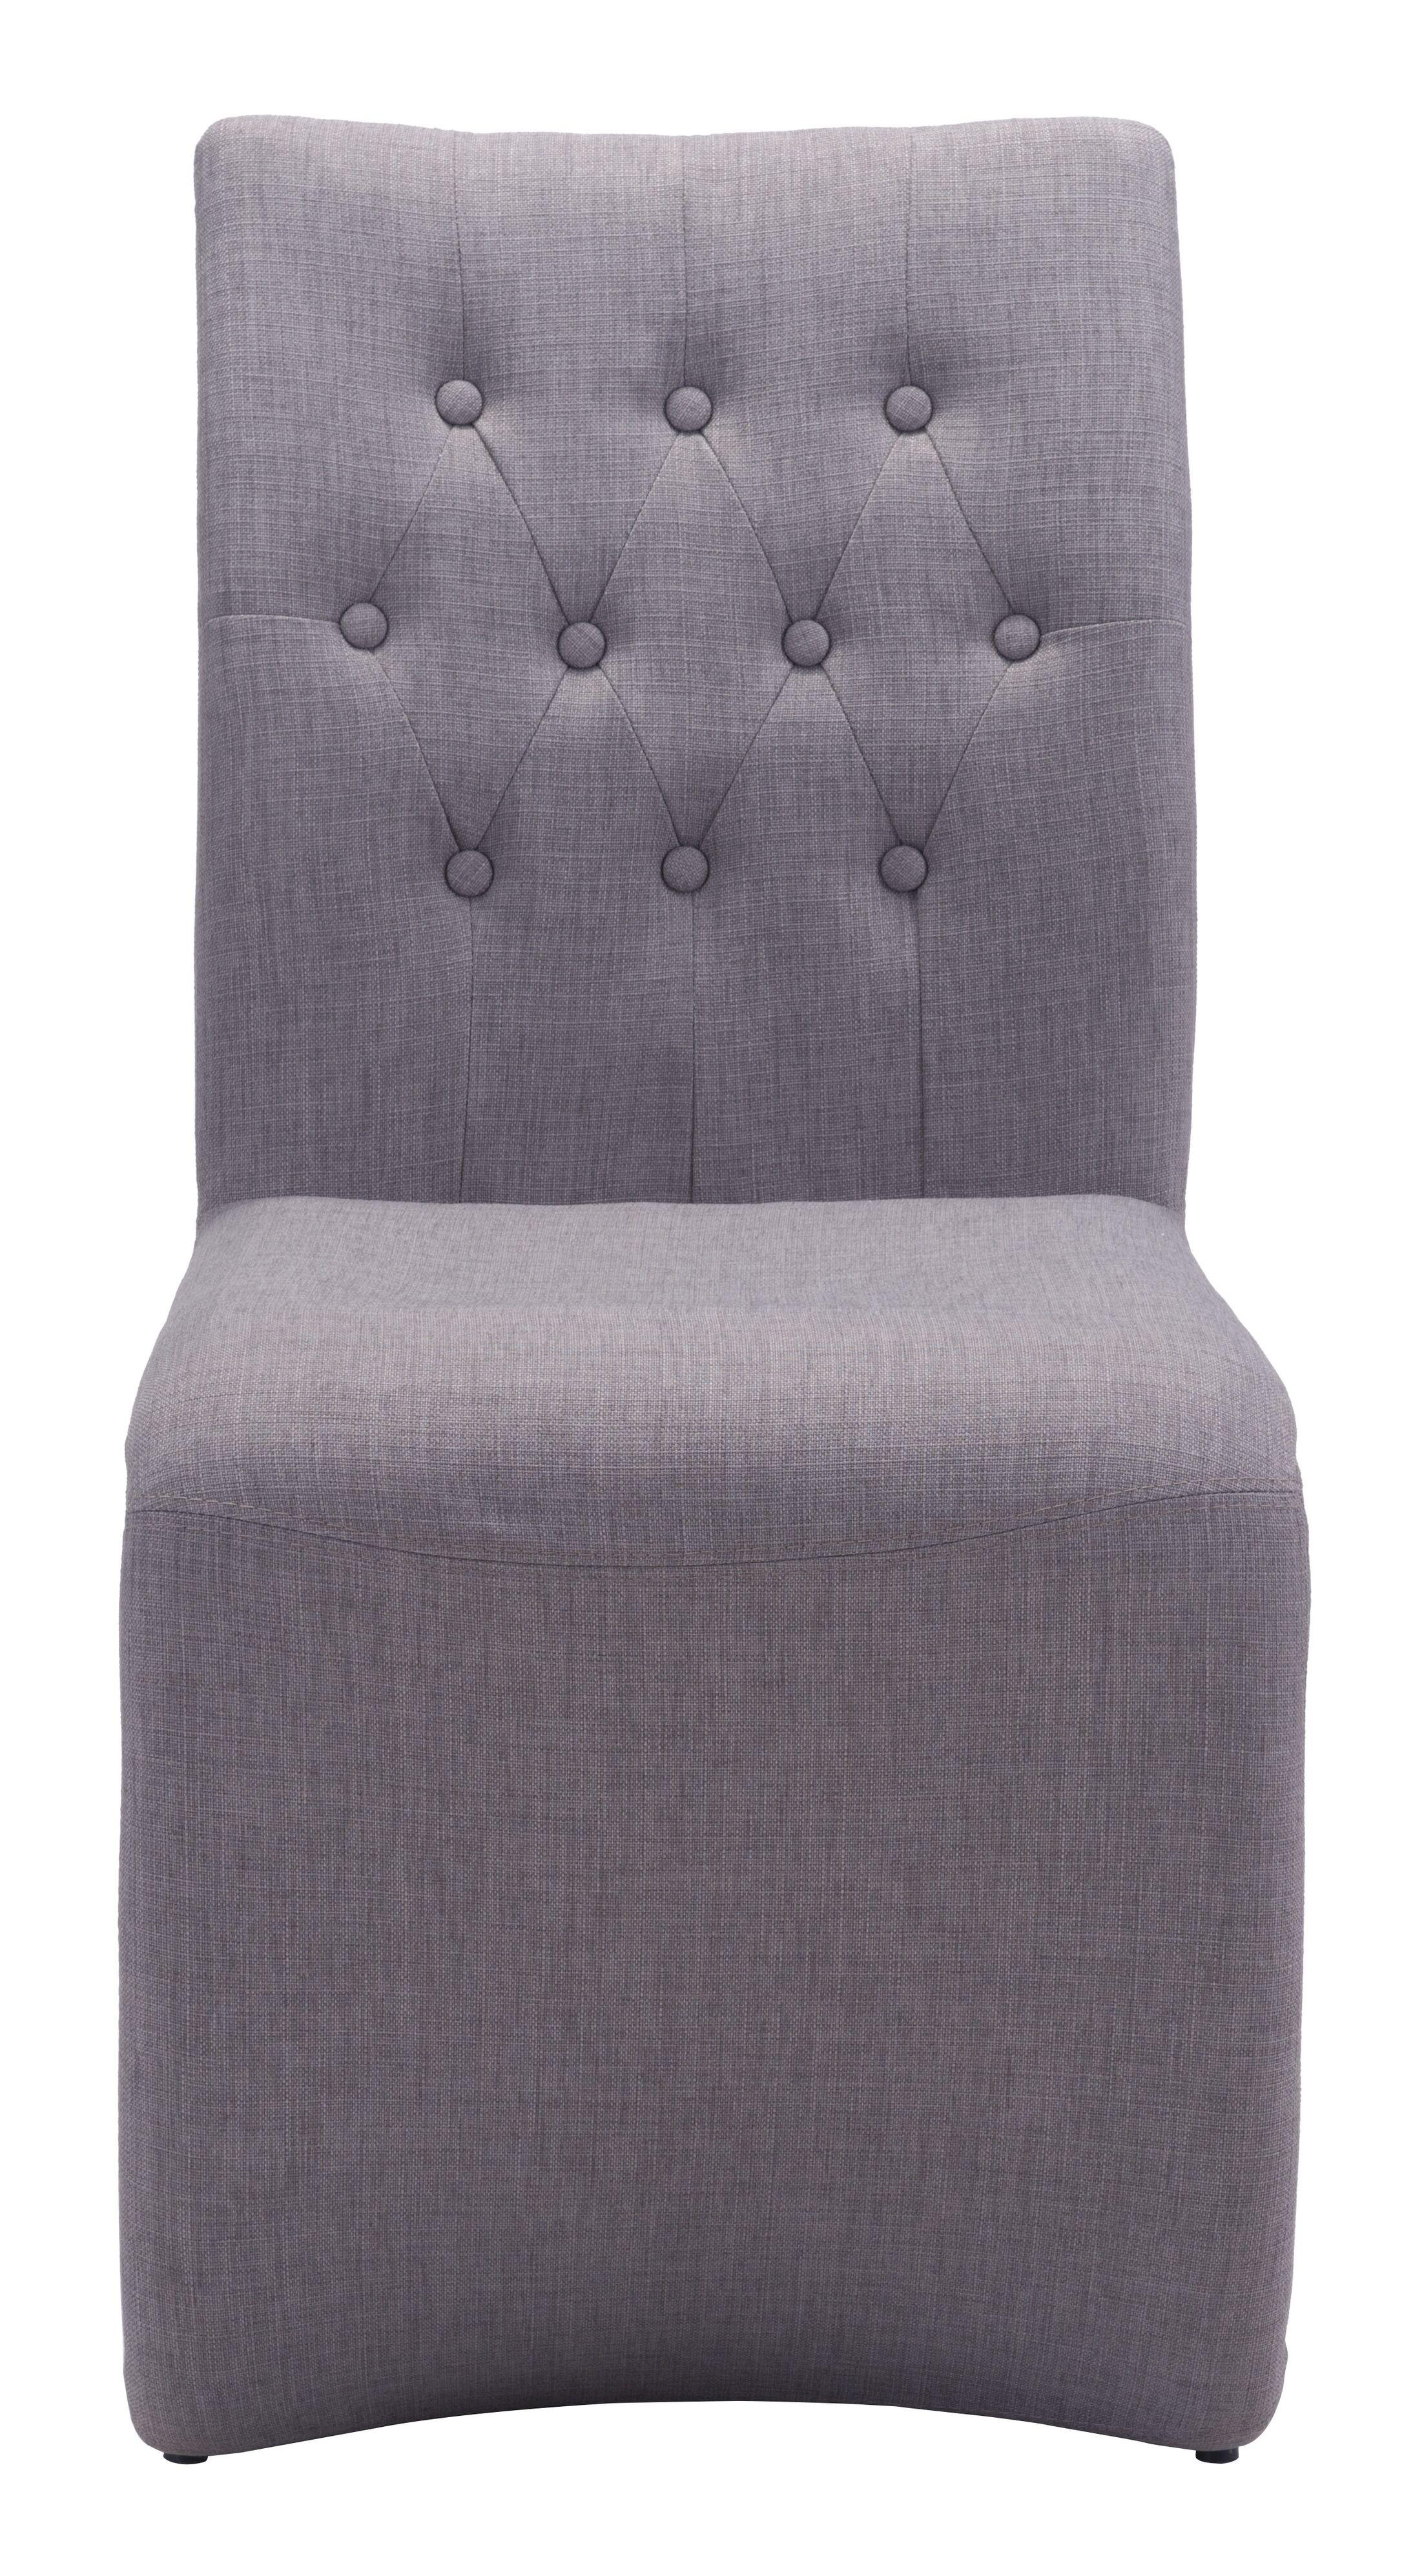 Cheryl Parsons Chair Upholstery: Beige